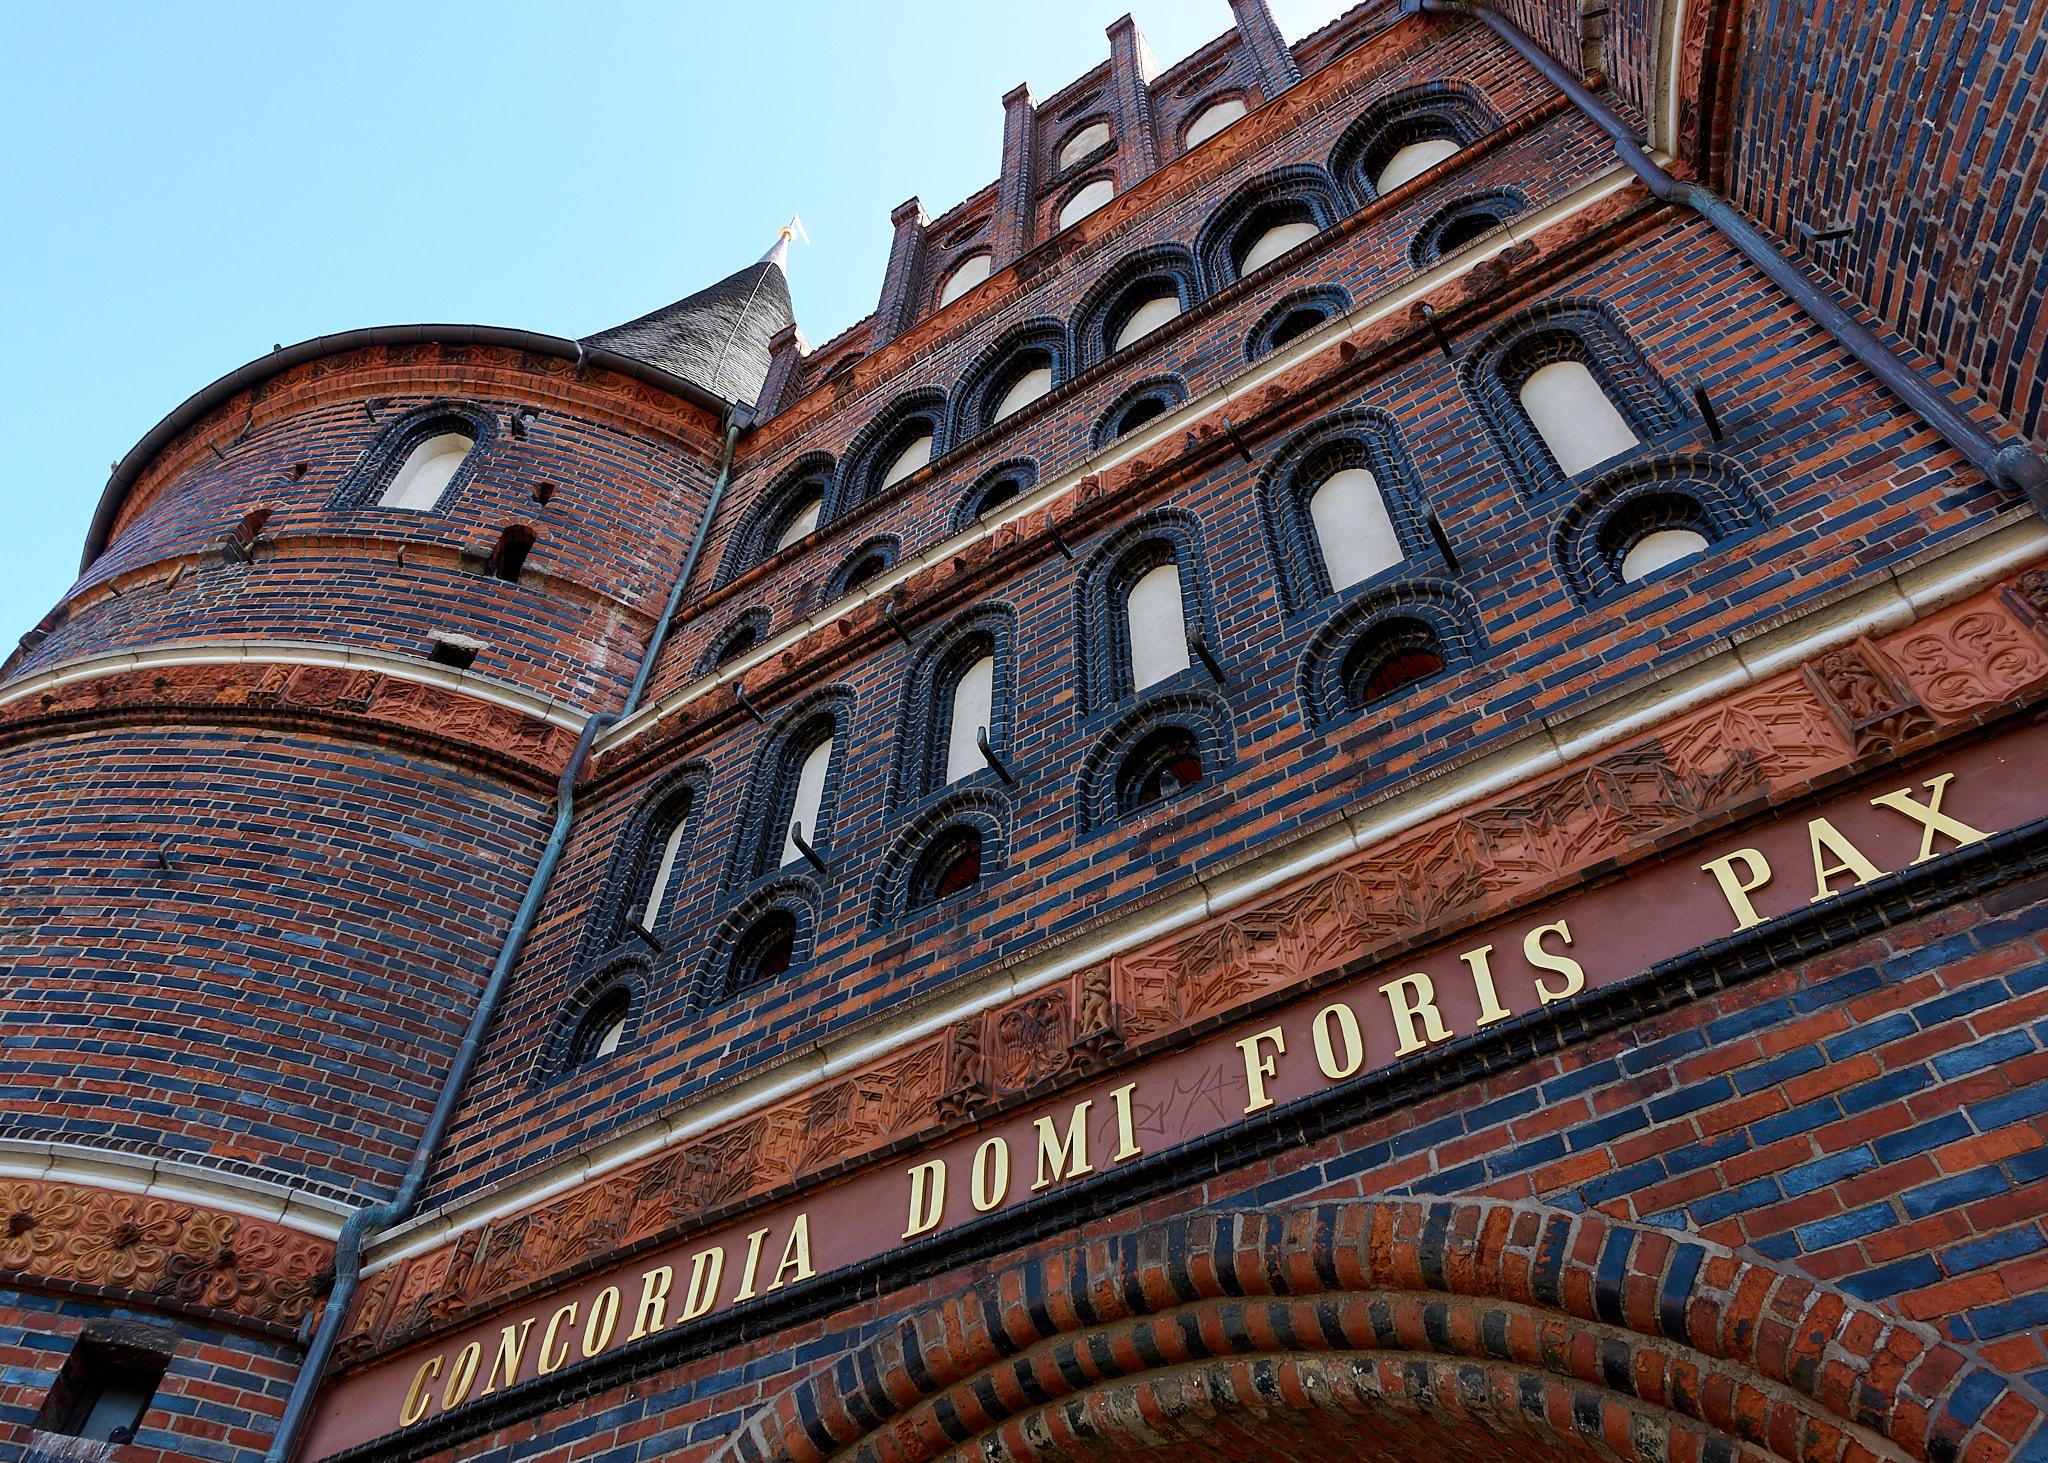 20190330-Lübeck-291.jpg